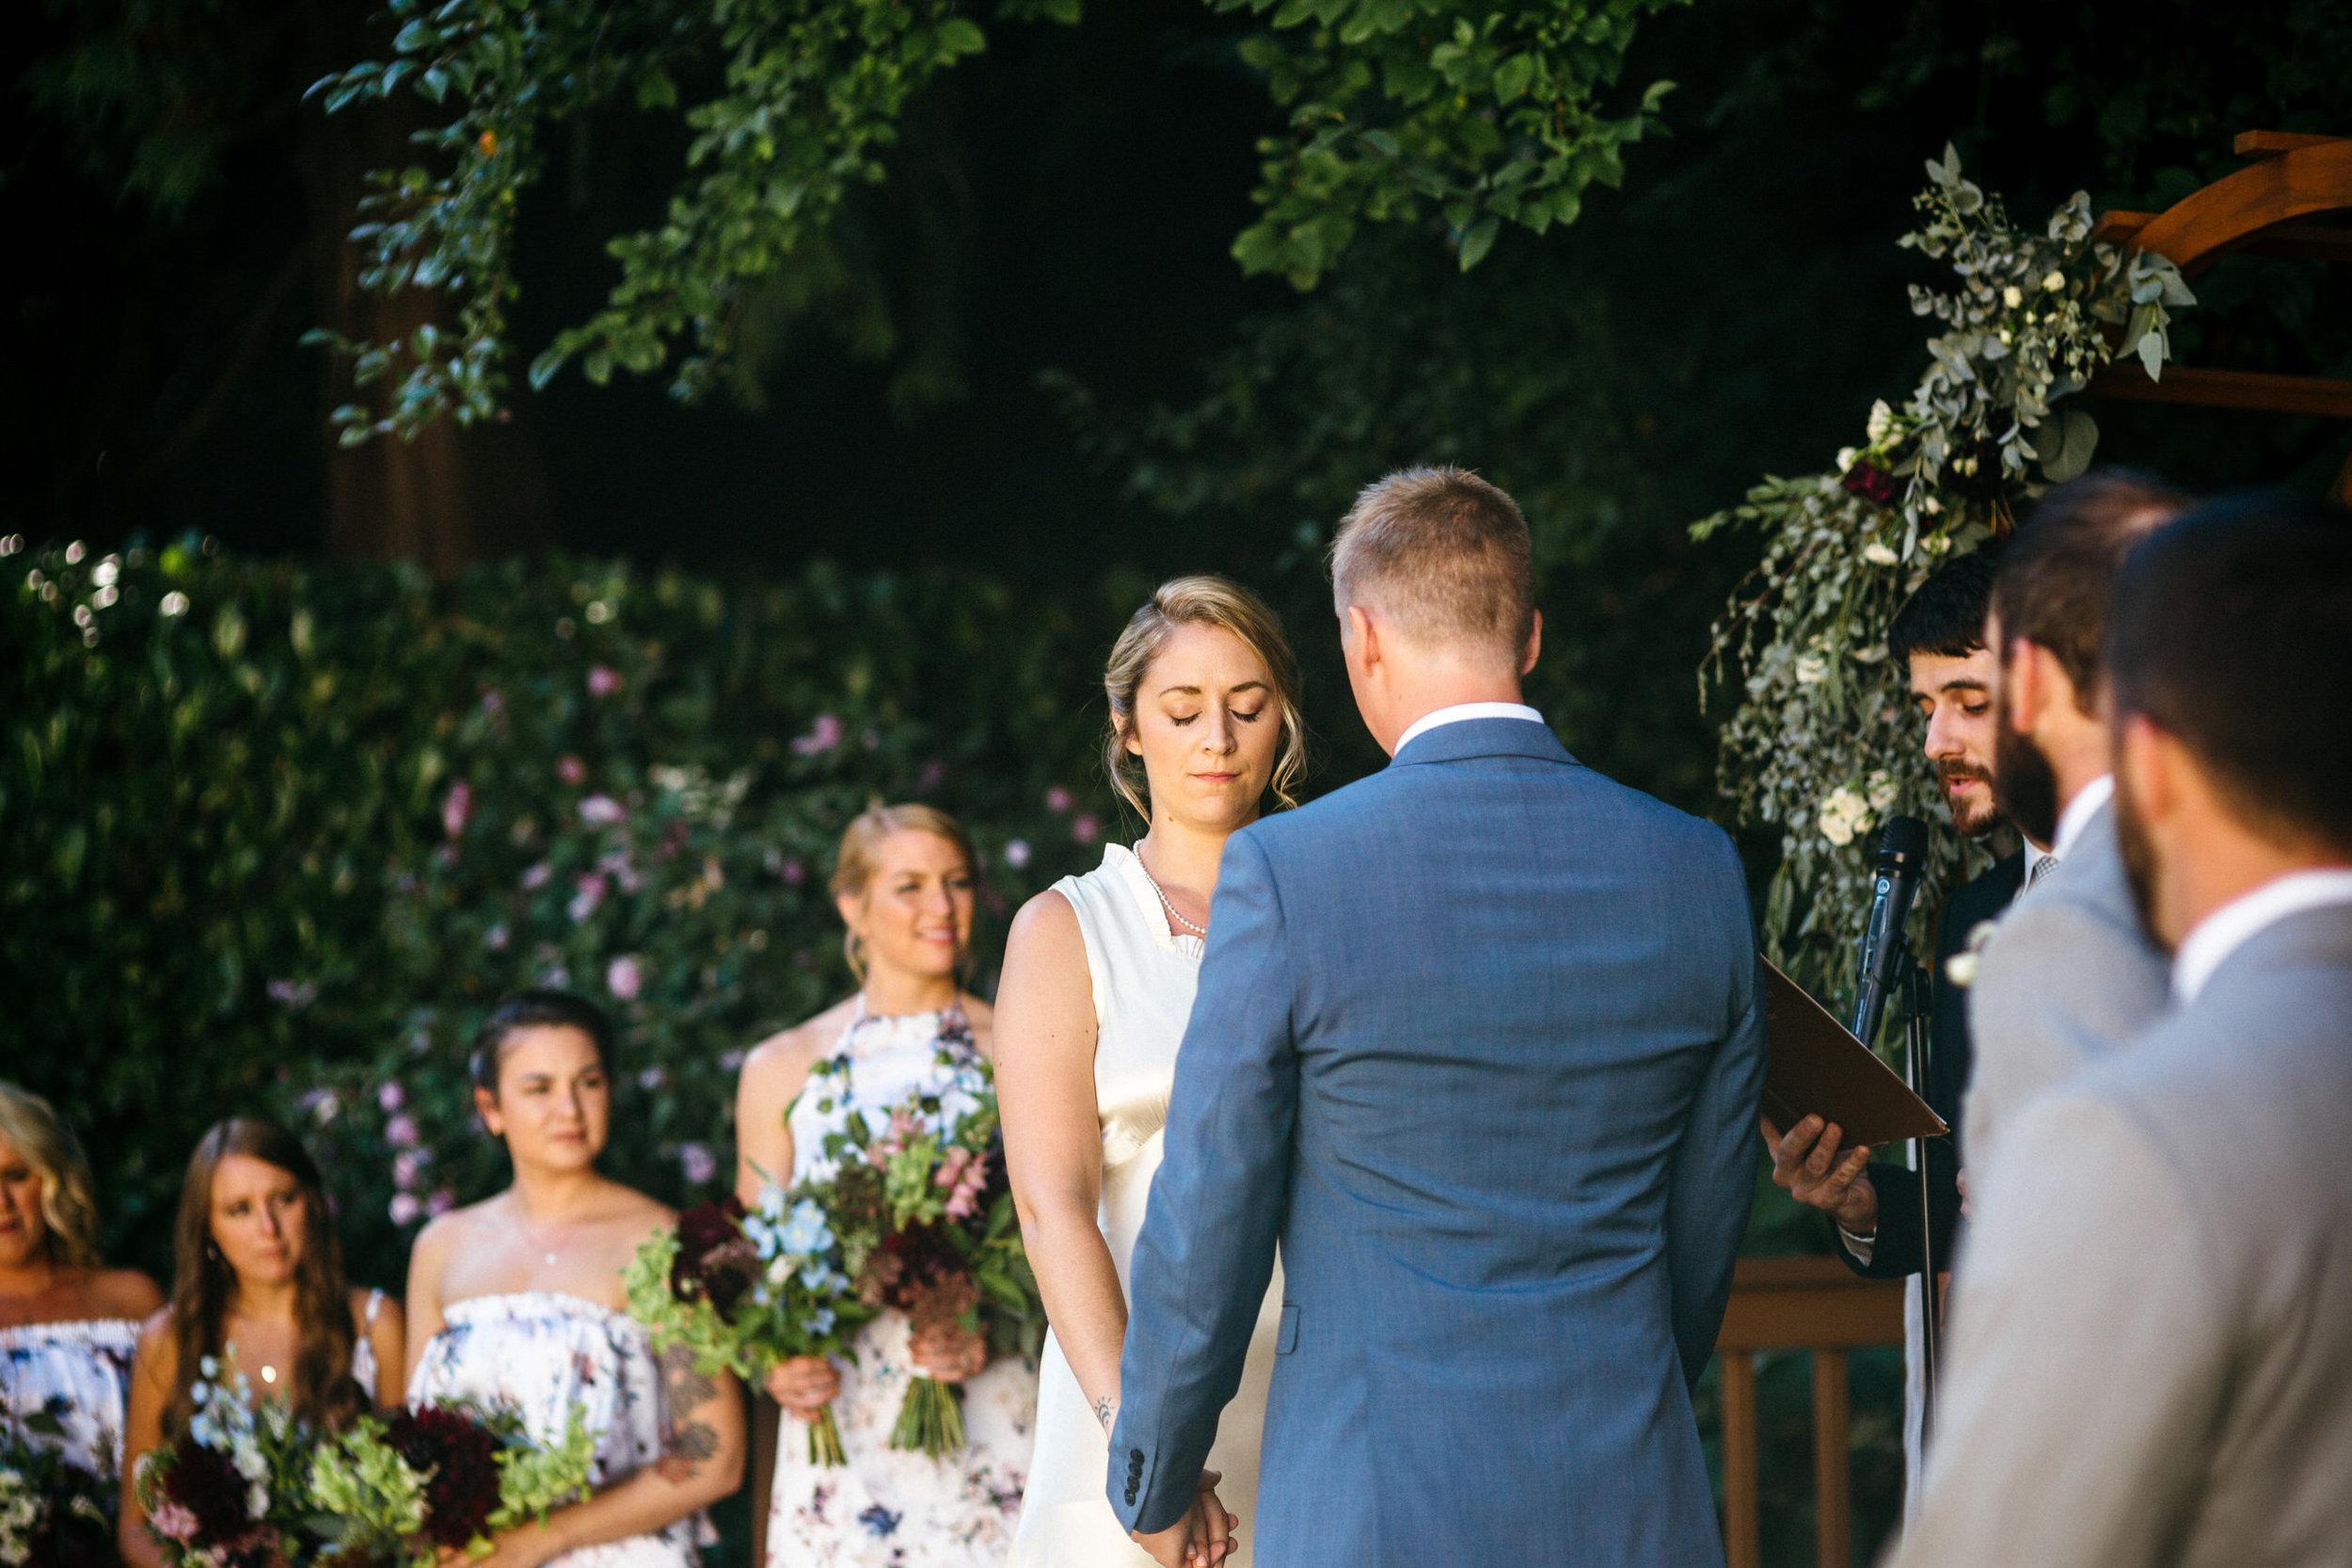 Laurelhurst Park club wedding photographer Portand pdx Oregon055.JPG